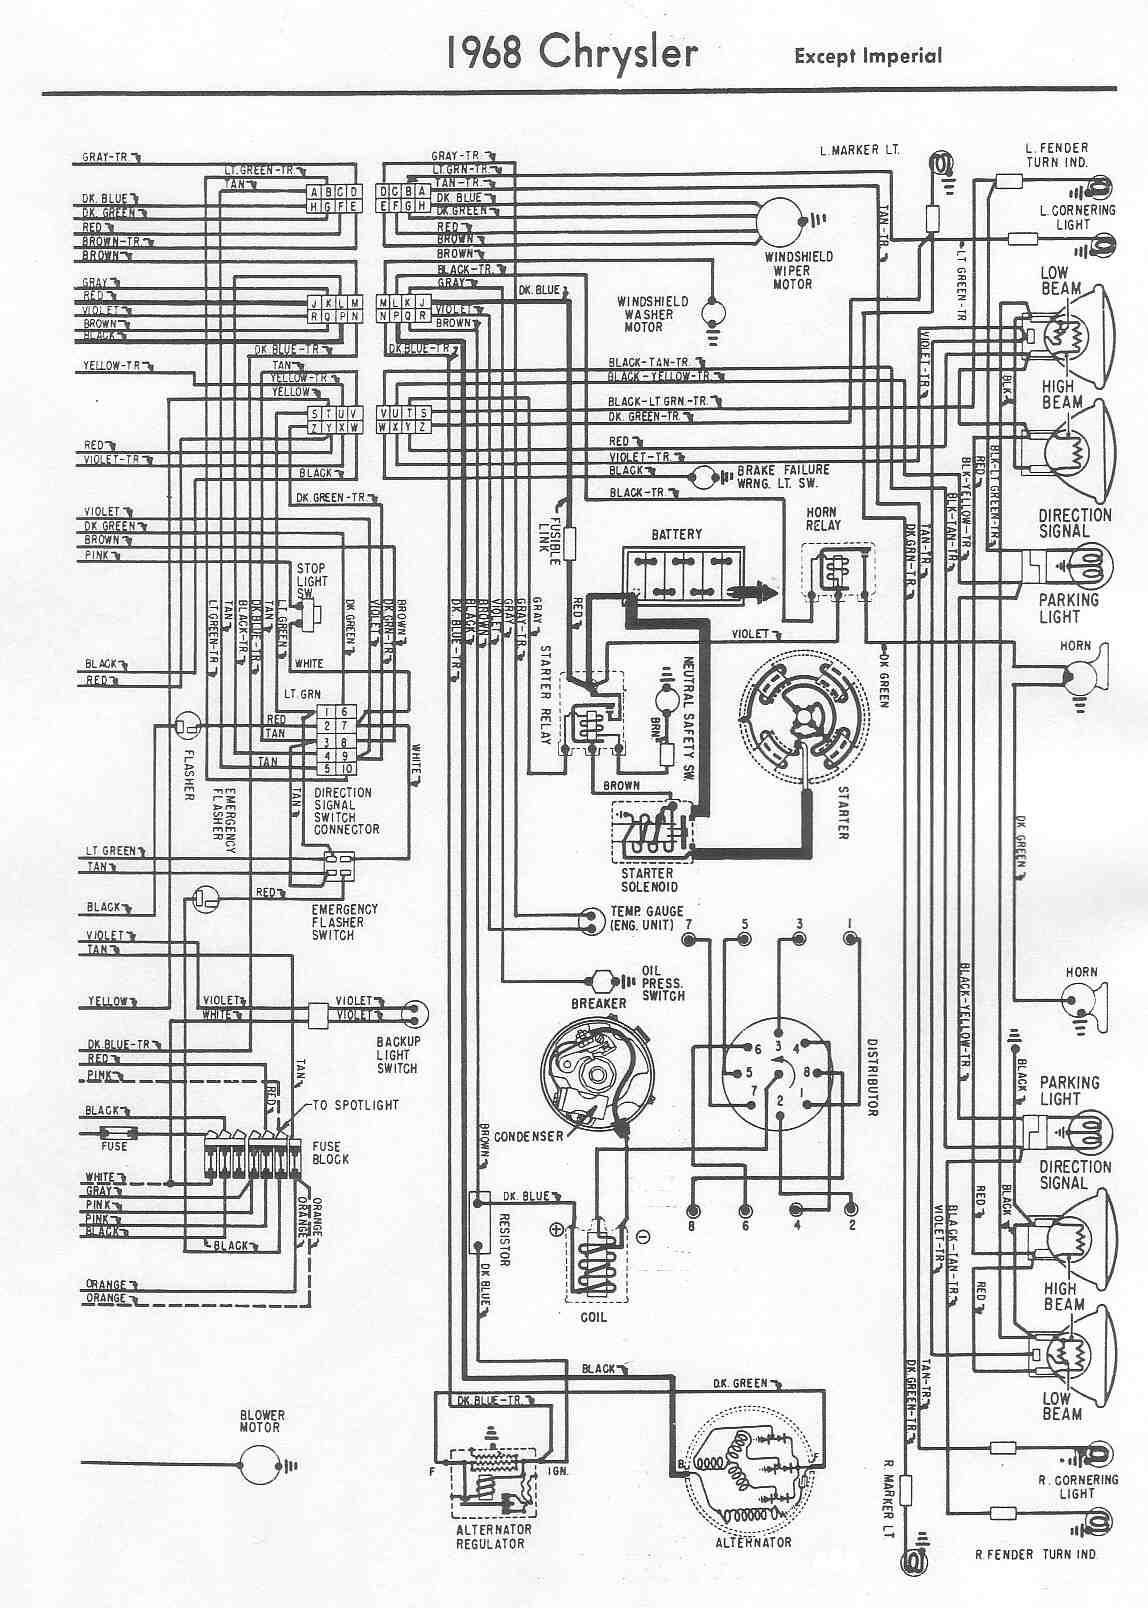 medium resolution of wiring diagram in addition 1972 chevy c10 wiring diagram on 68 1969 pontiac gto wiring diagram 68 gto dash wiring diagram